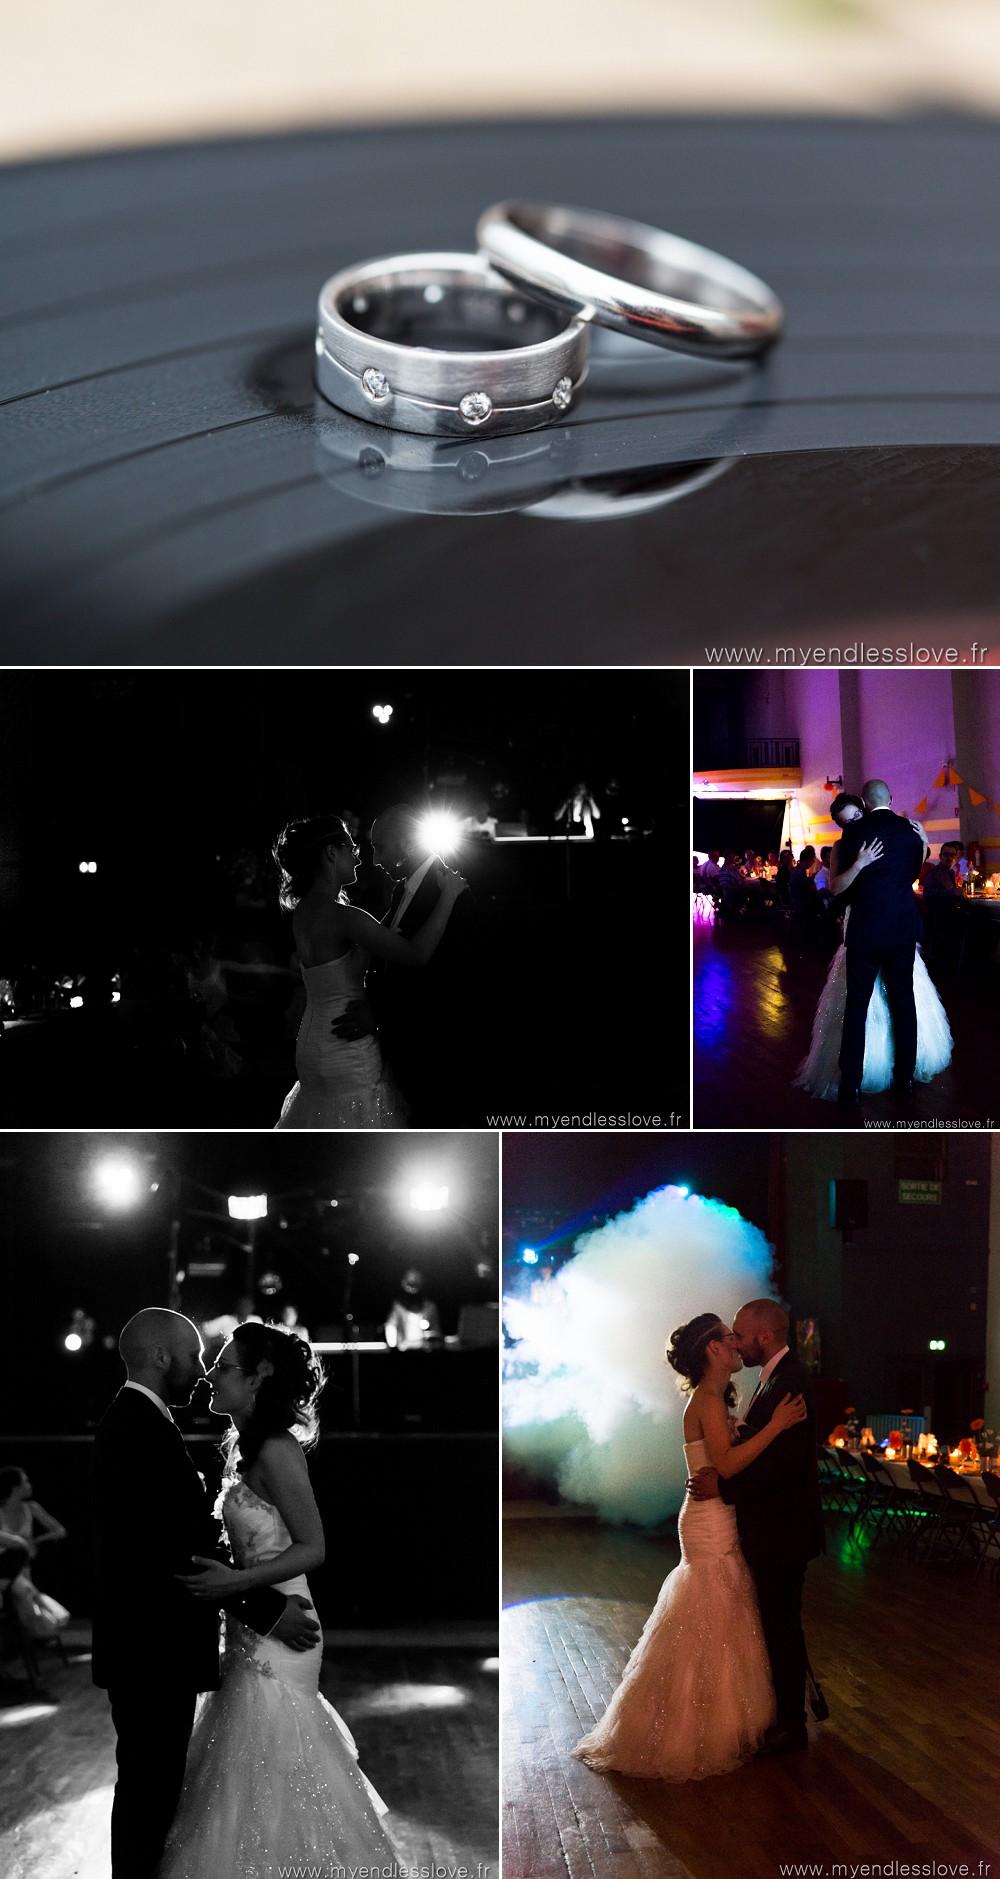 myendlesslove-photographe-mariage-lille-8-Strasbourg-Hénin Beaumont-soirée-danse-photobooth-melanie-reichhart (1)